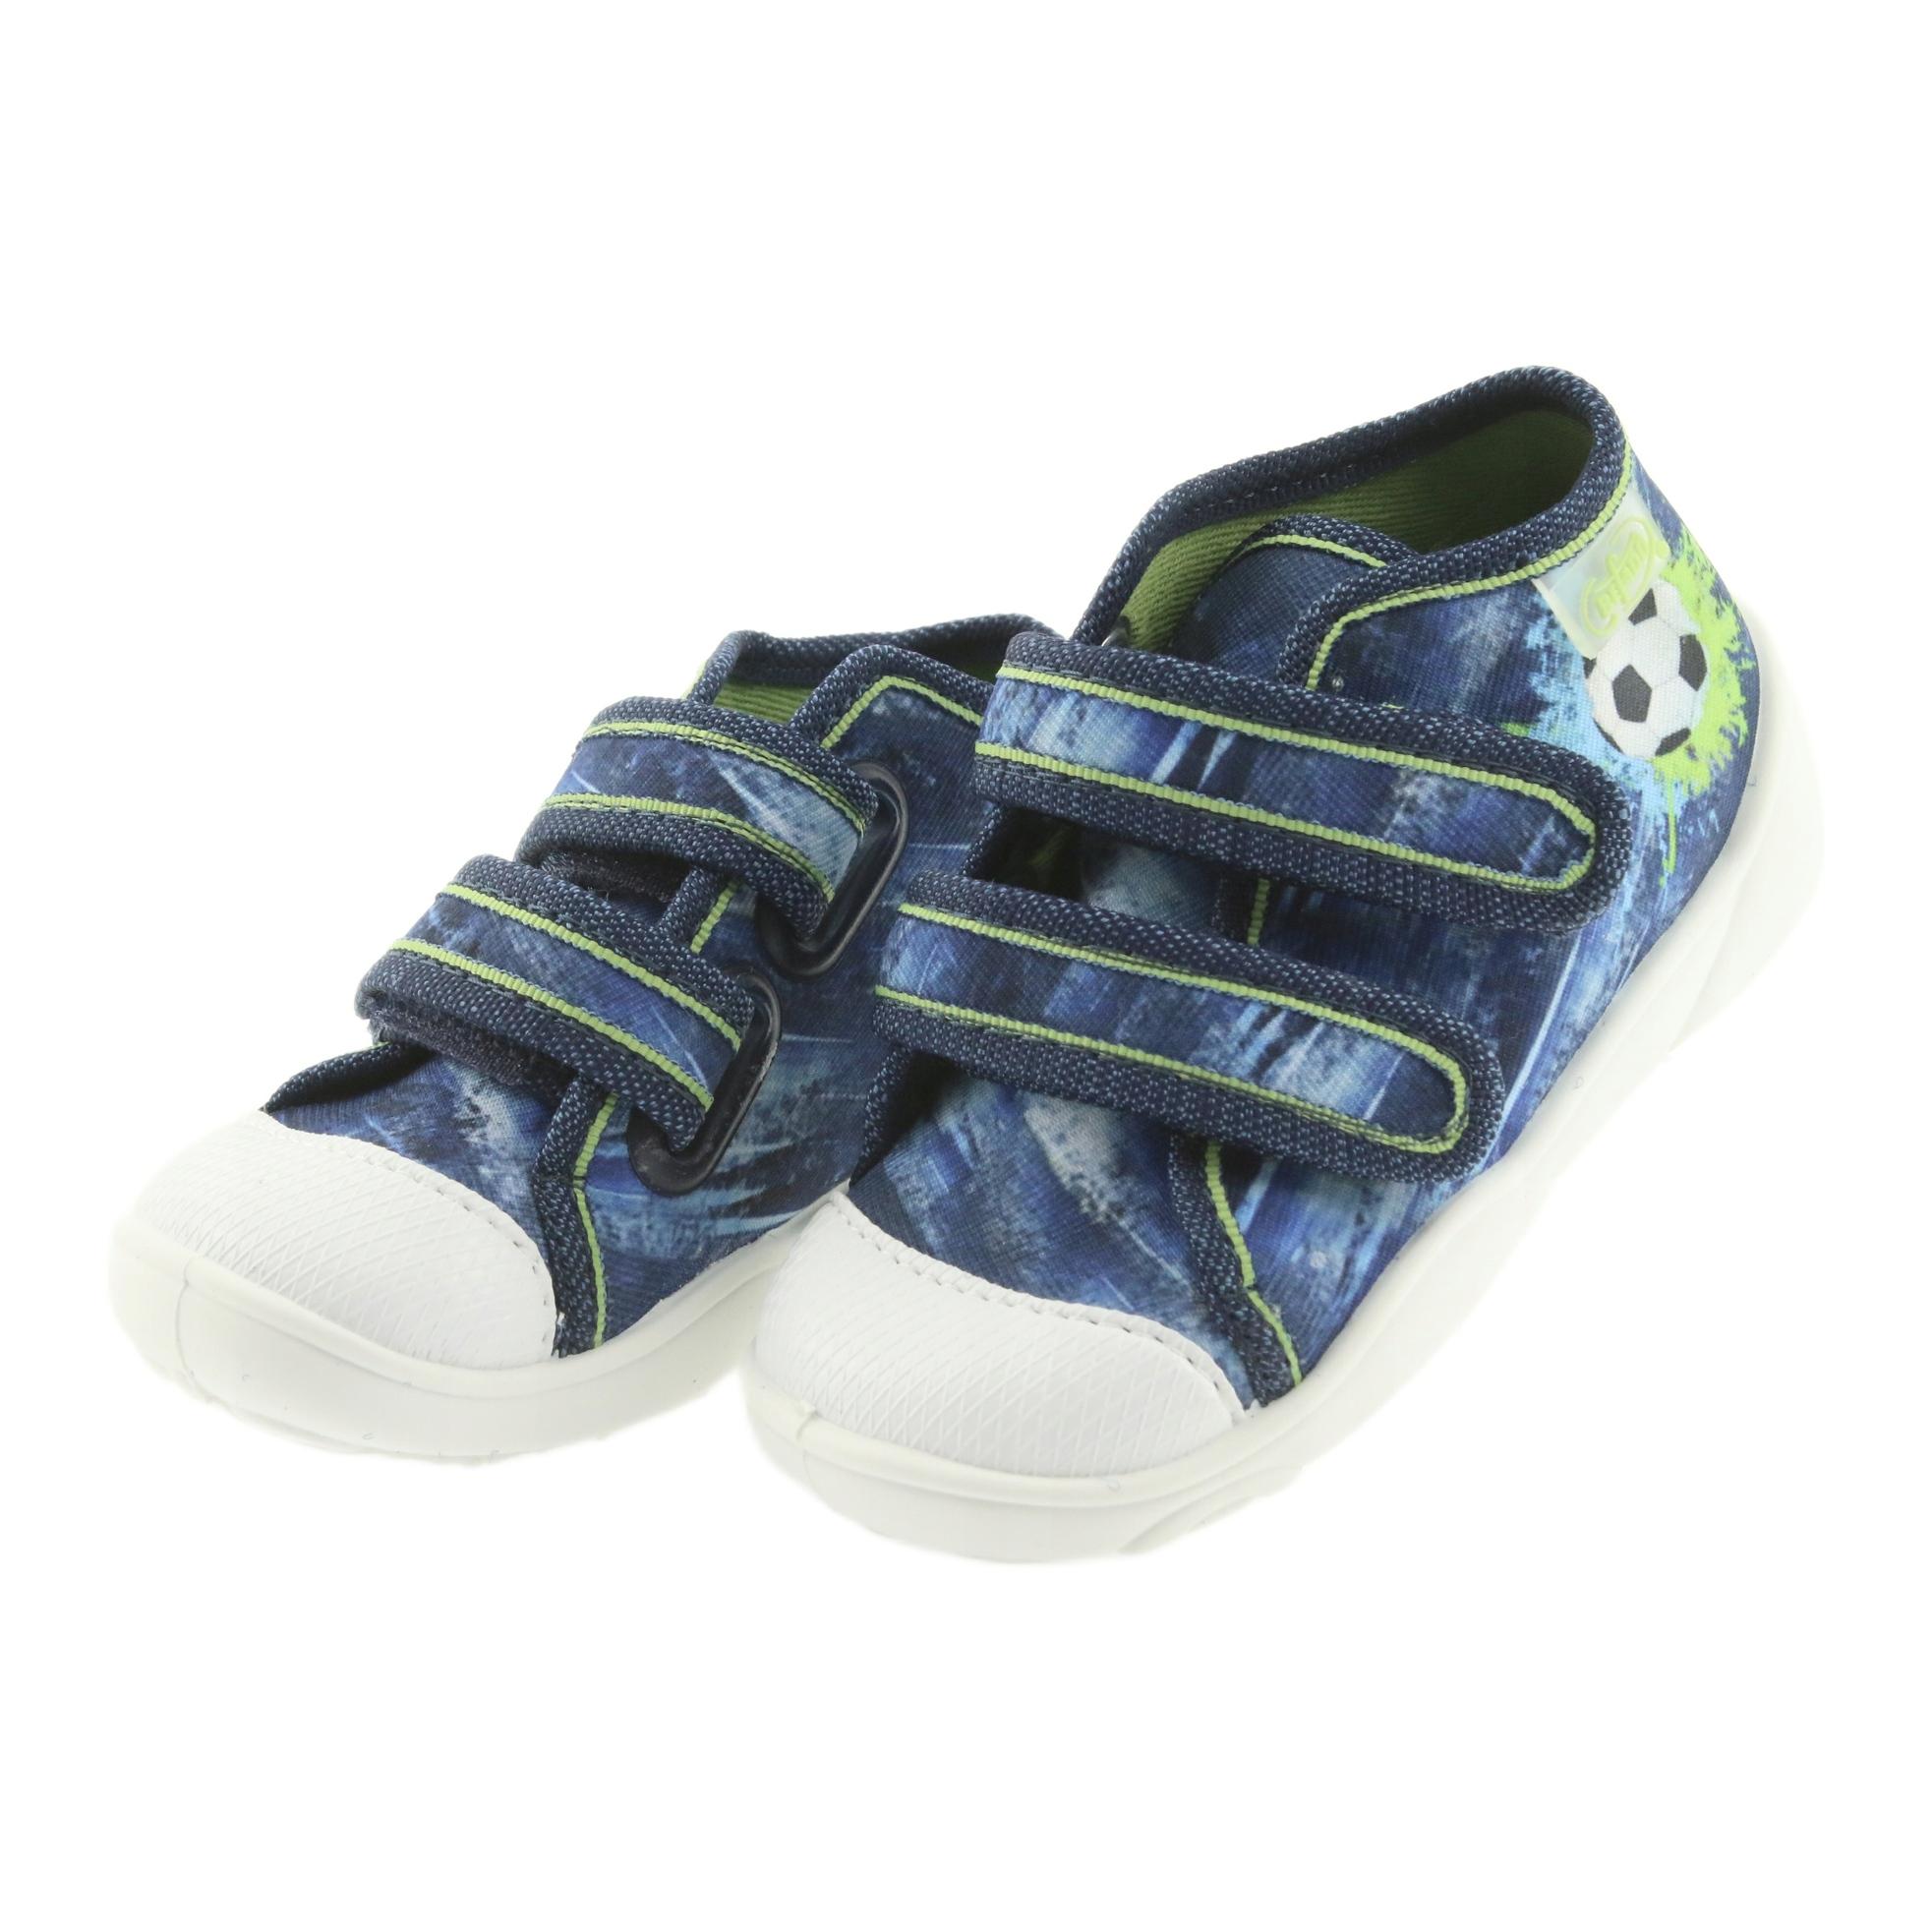 miniatura 4 - Scarpe da calcio per bambini Befado 212P058 blu verde marina